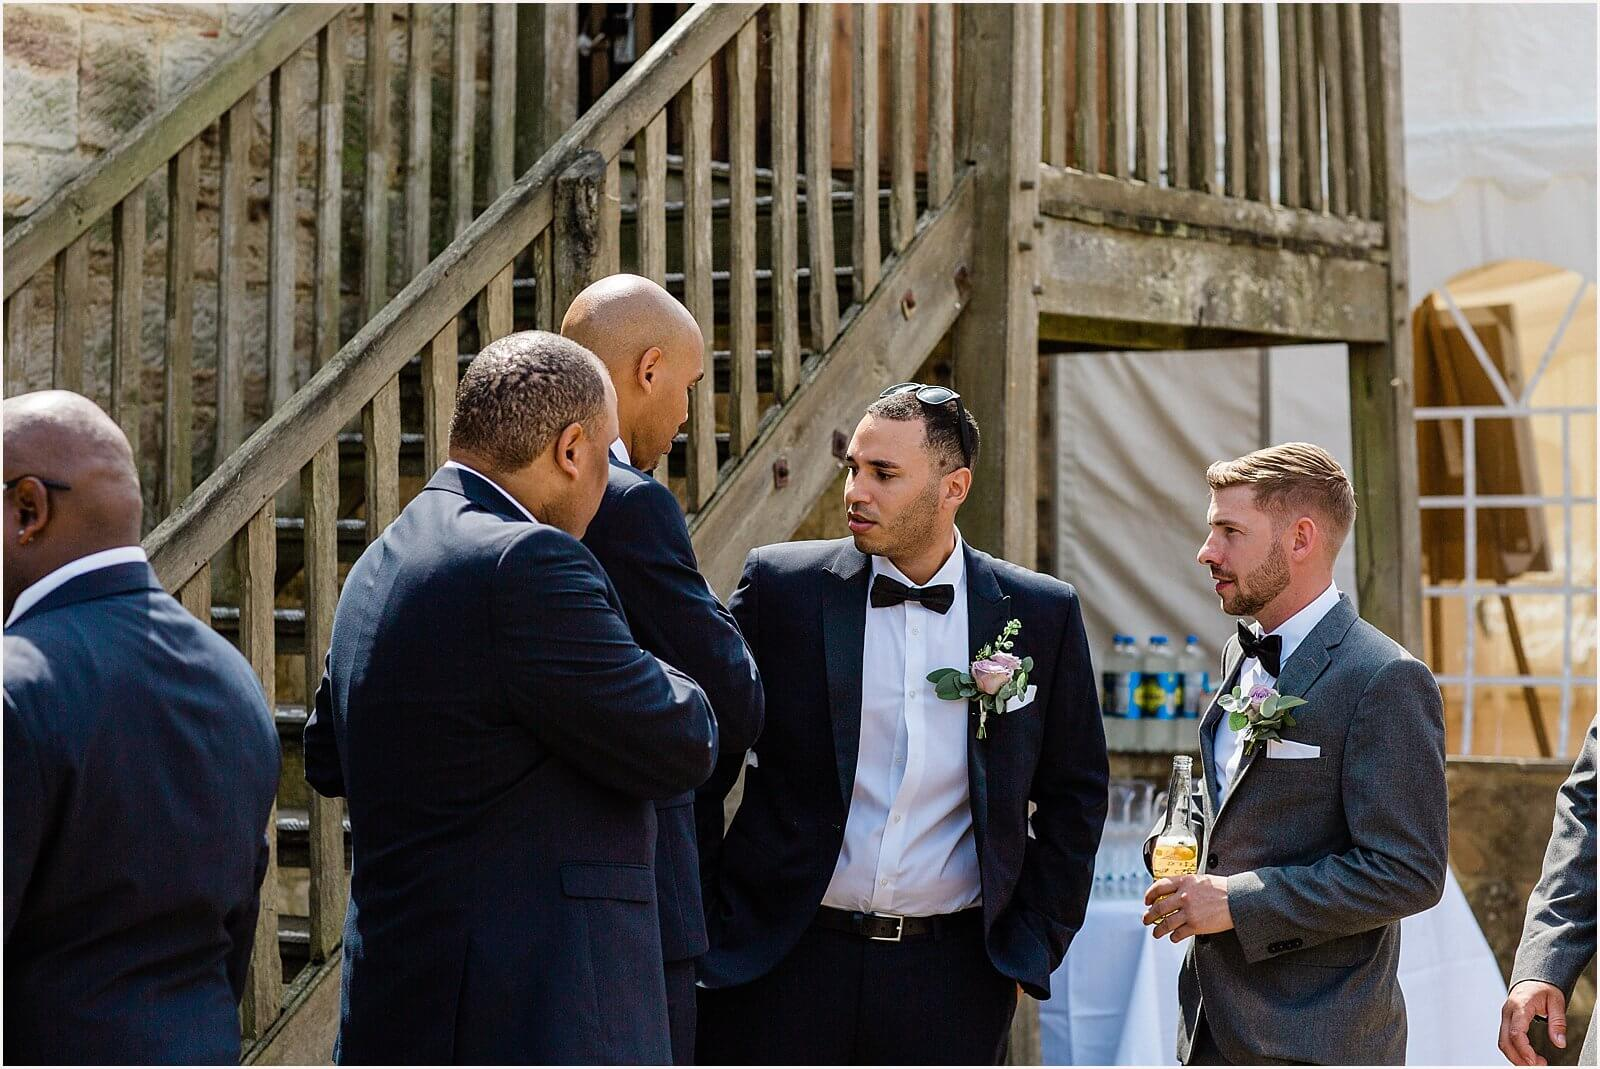 Swallows Oast Wedding - Jakki + Luke's barn wedding photography 20